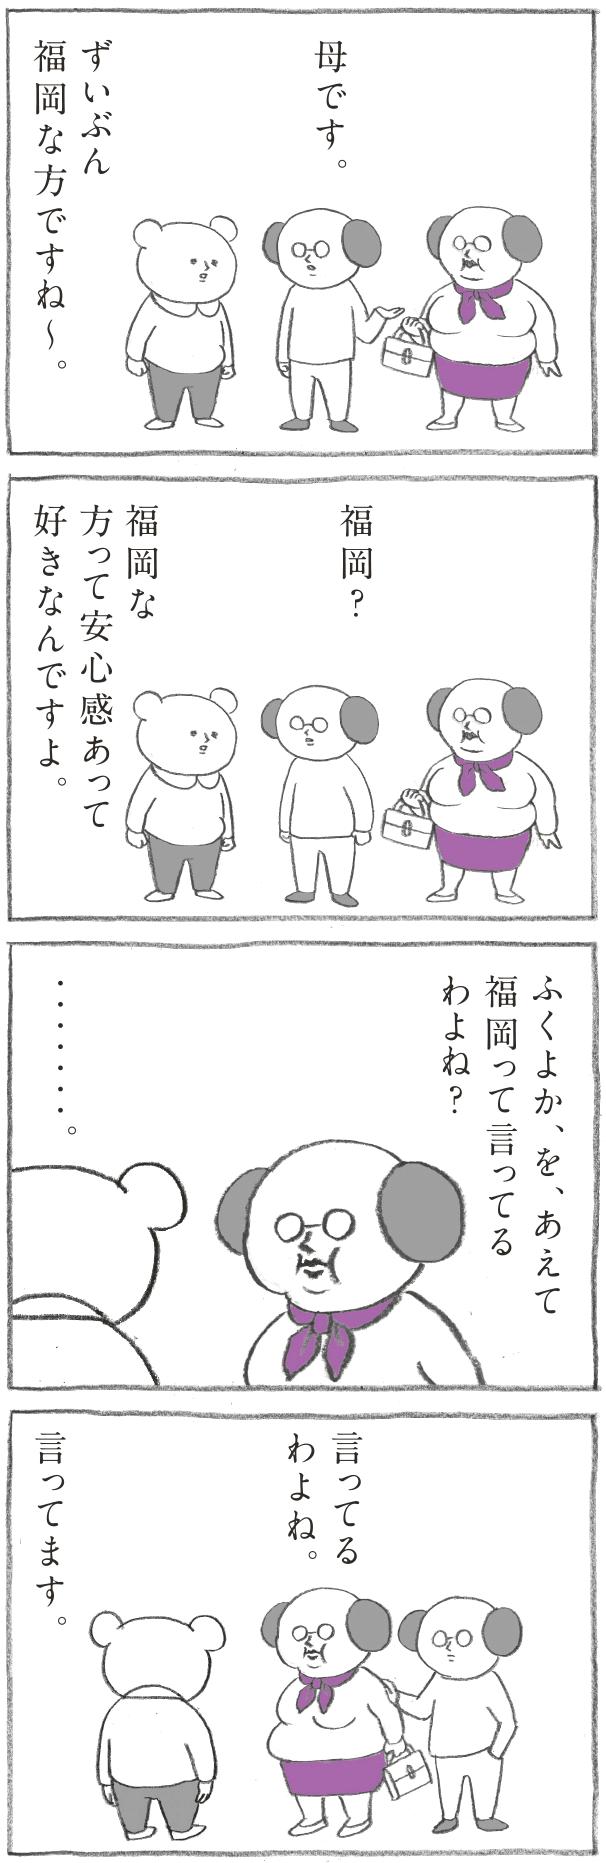 Hanako 1172号:おかわり自由